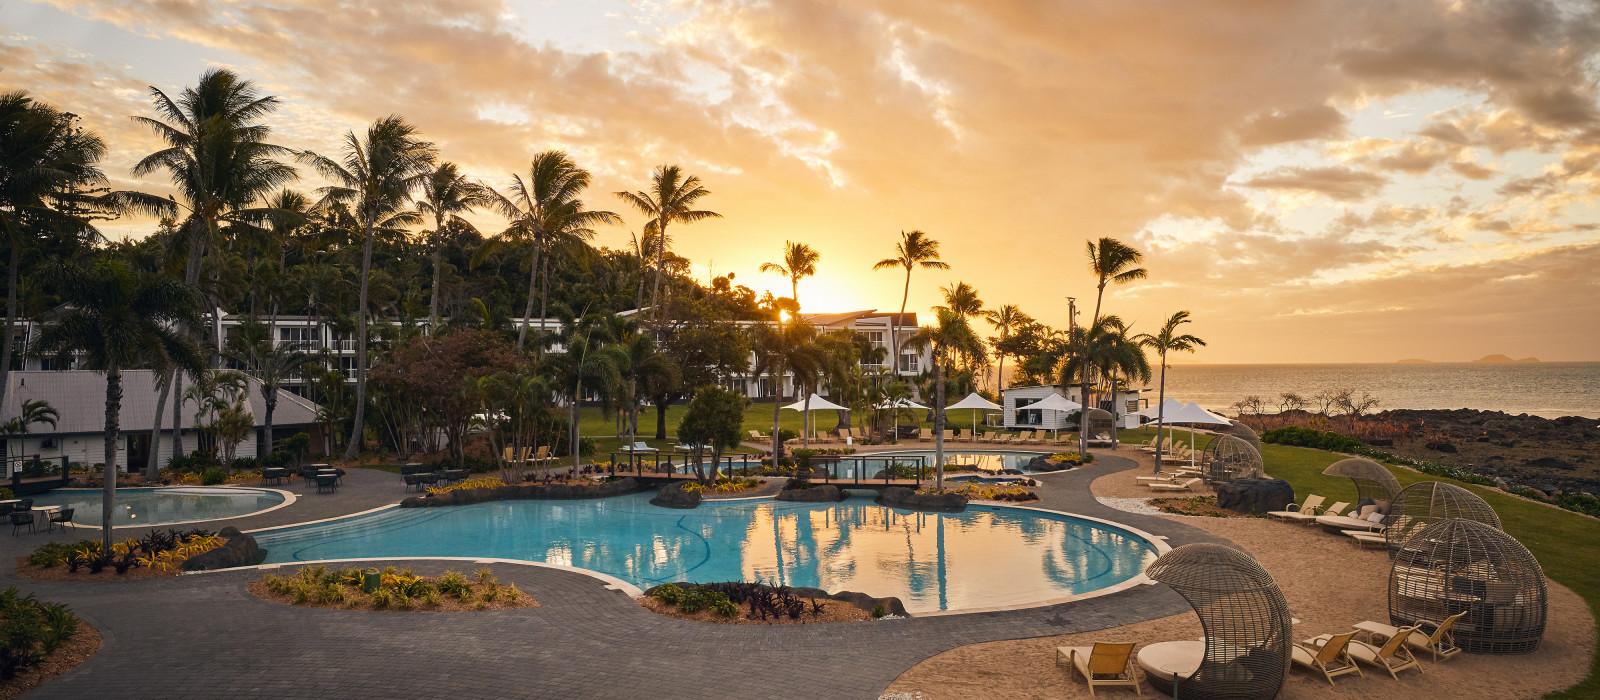 Hotel Daydream Island Resort Australia